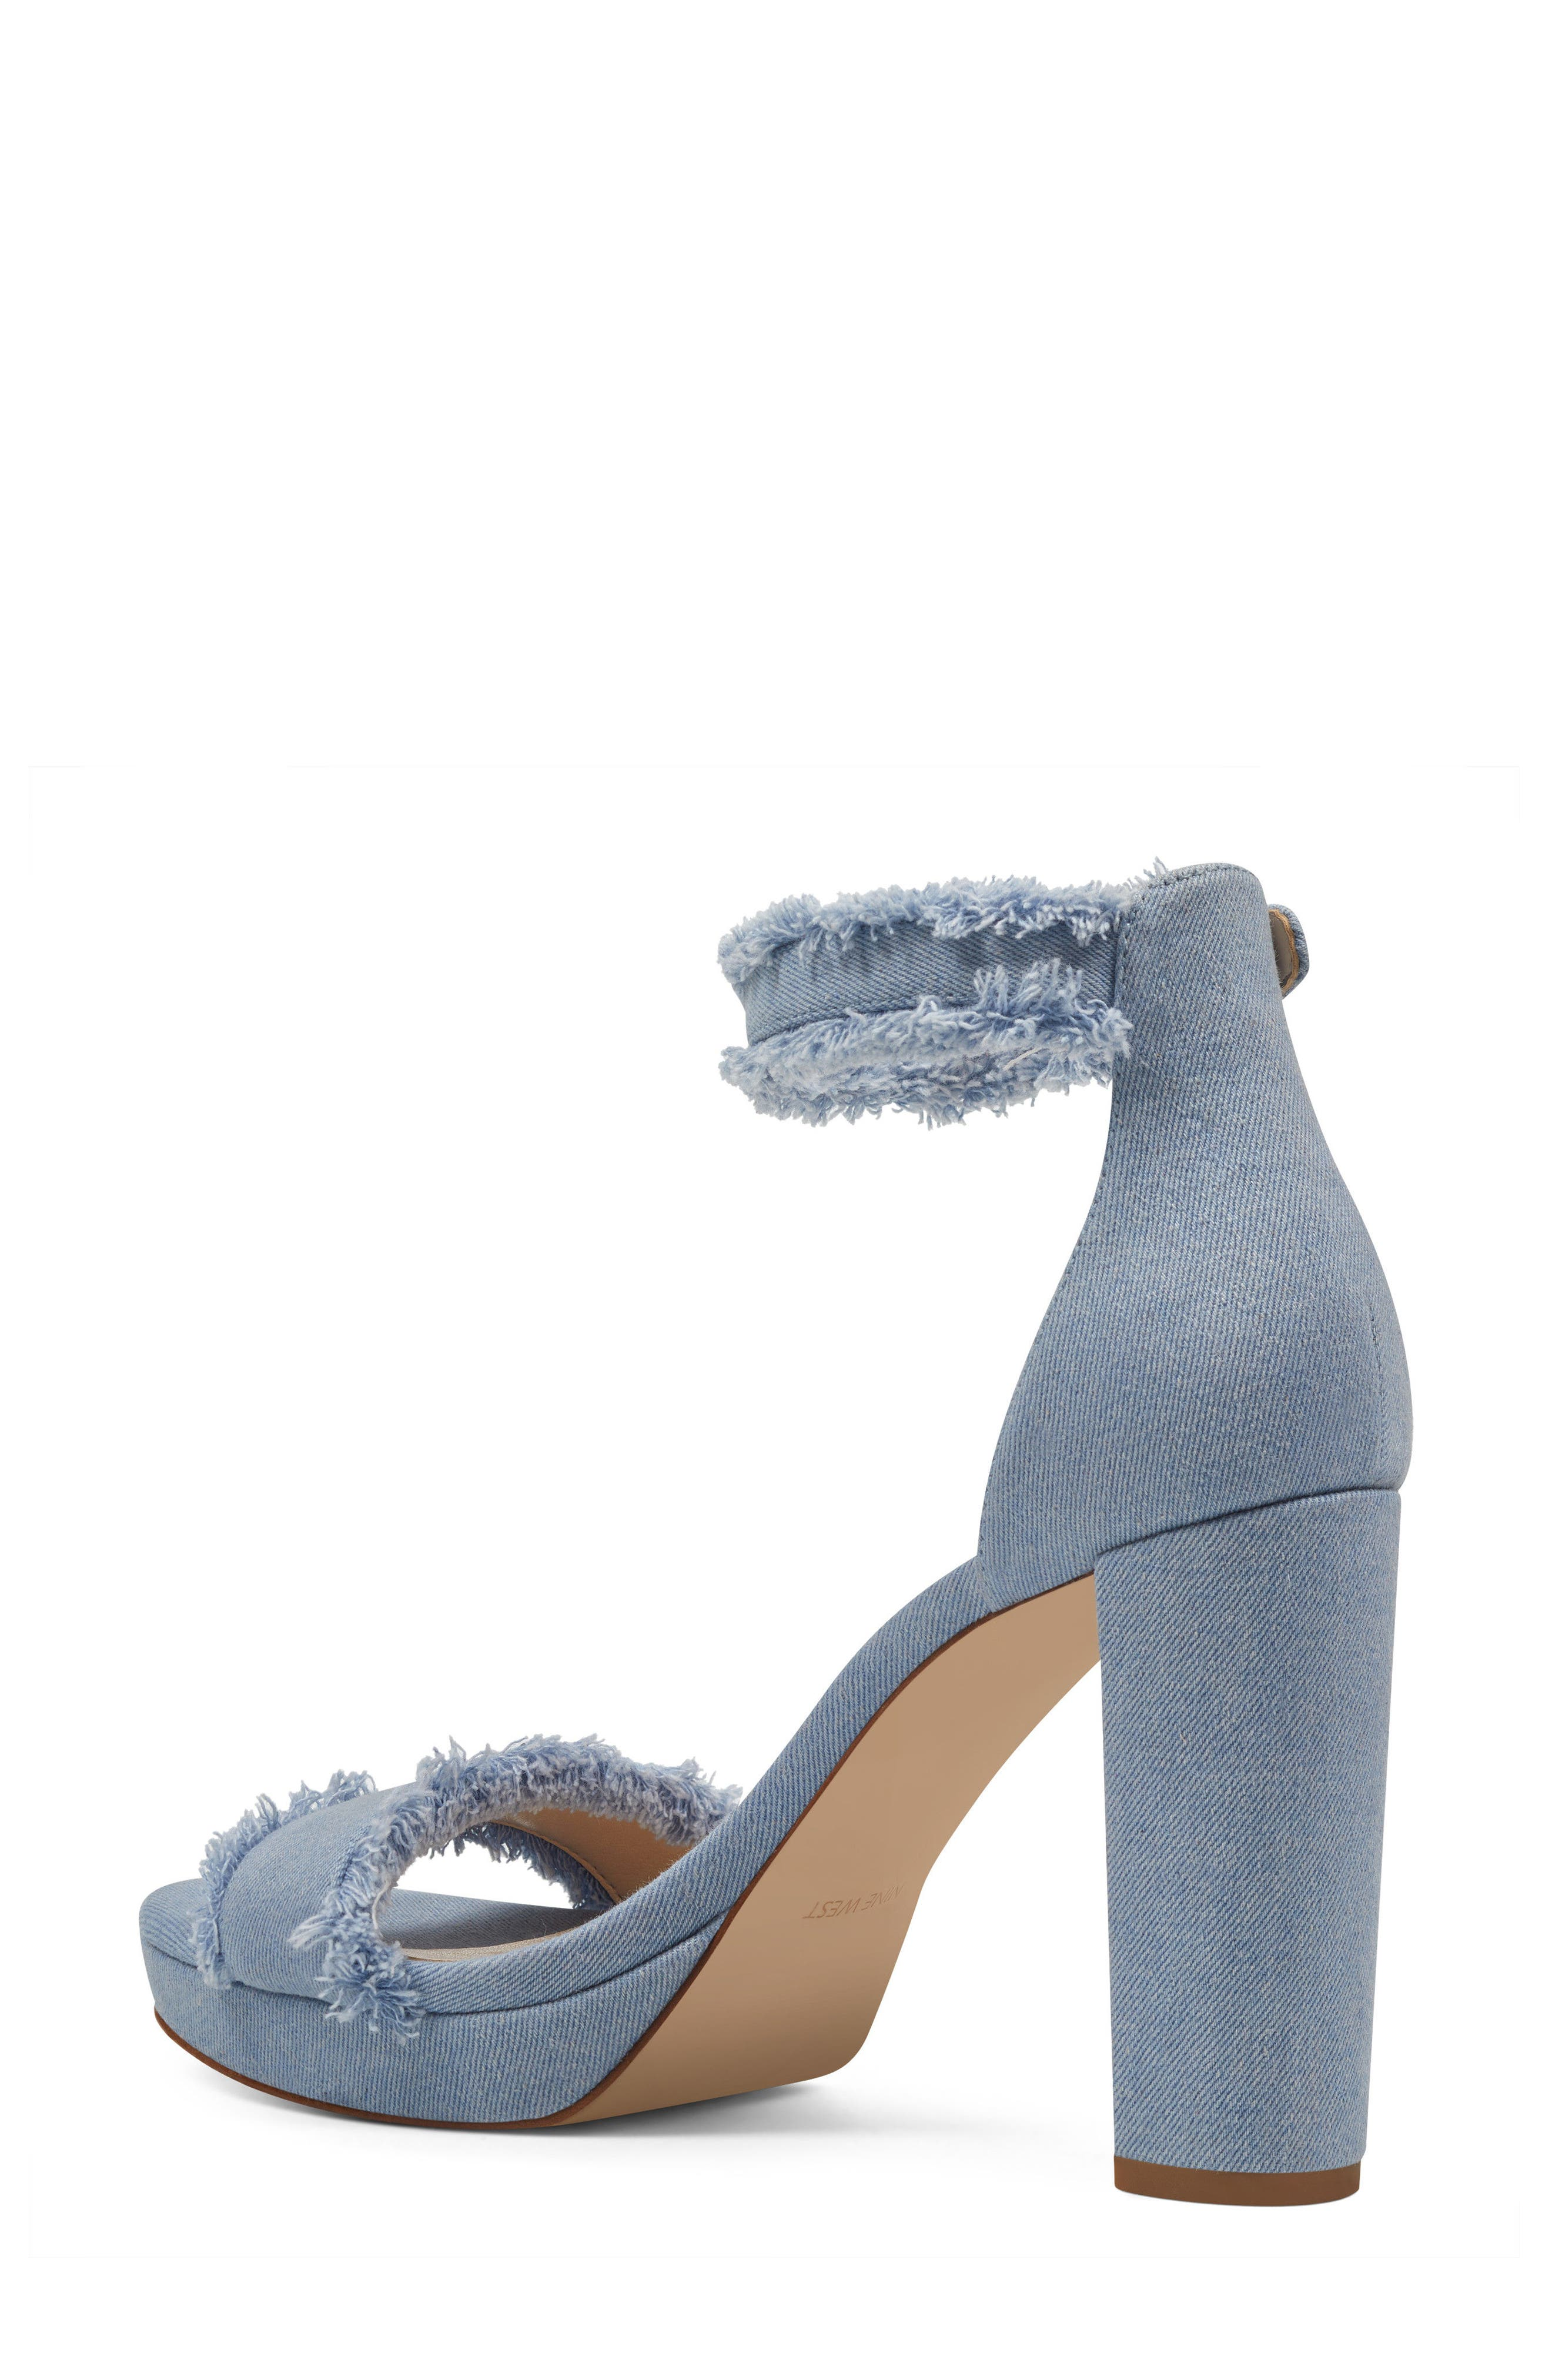 Daranita Ankle Strap Sandal,                             Alternate thumbnail 6, color,